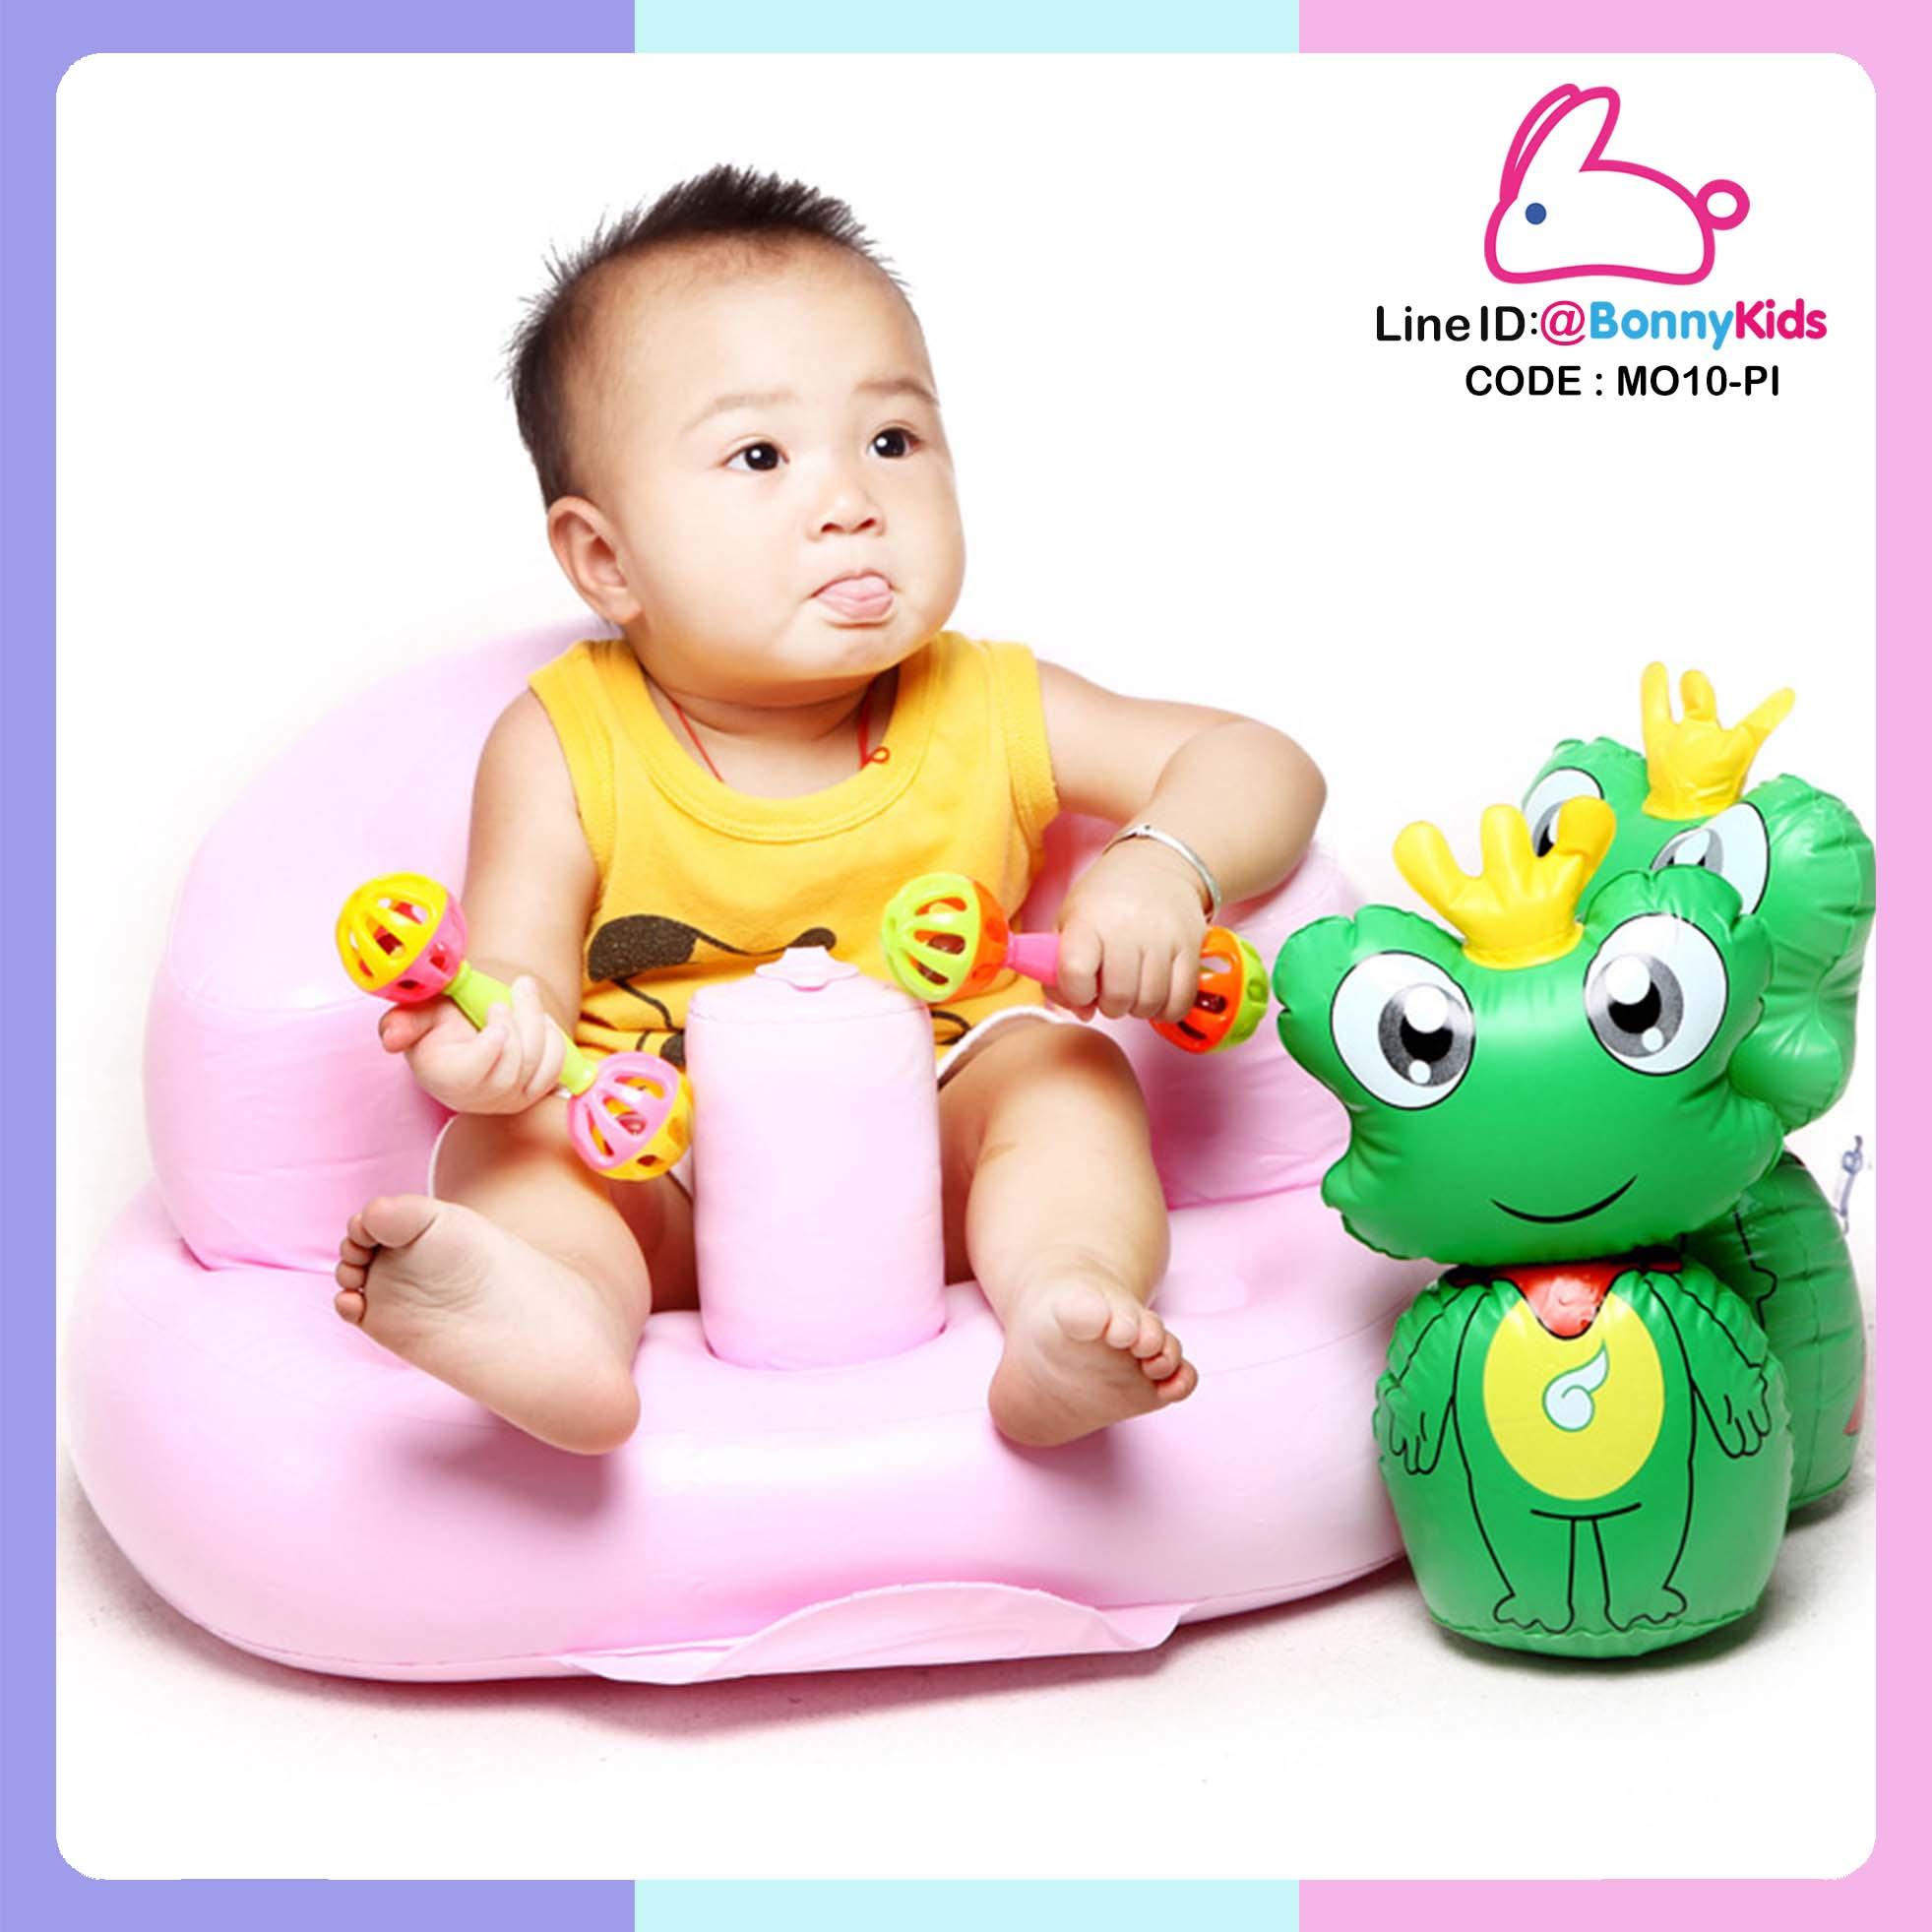 MO10-GR เก้าอี้หัดนั่งเป่าลม สีชมพู